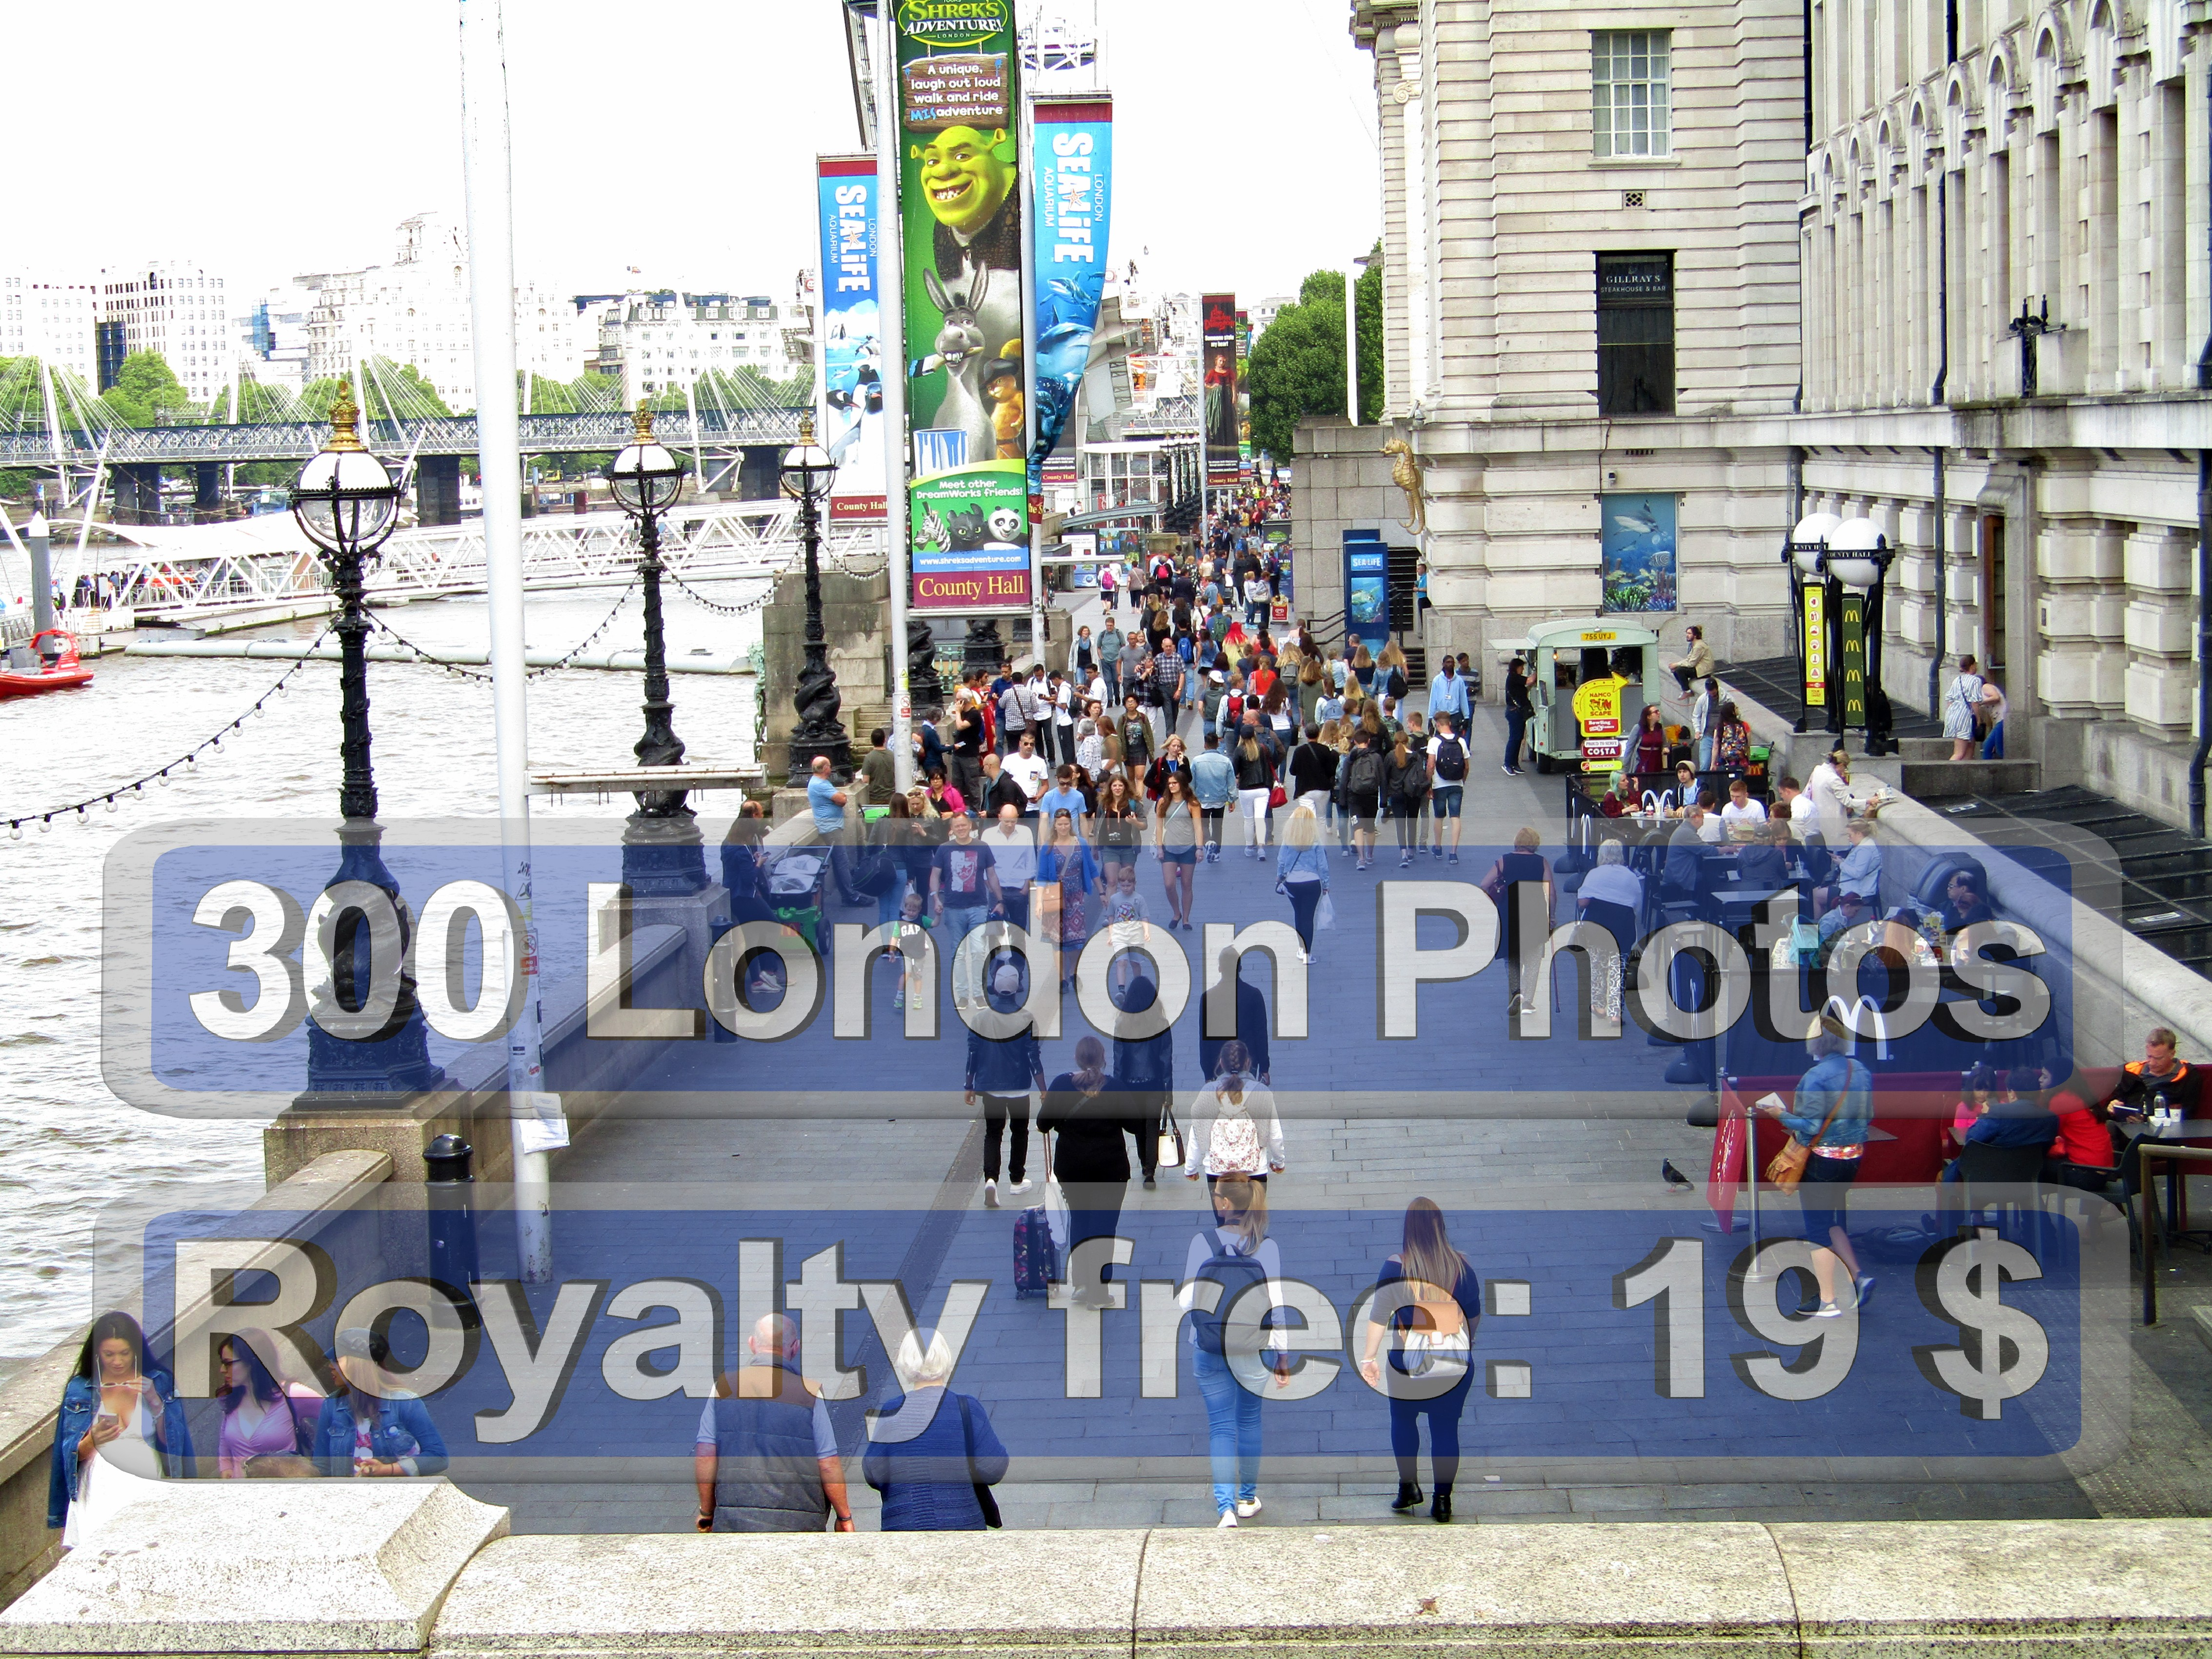 London Photo Challenge